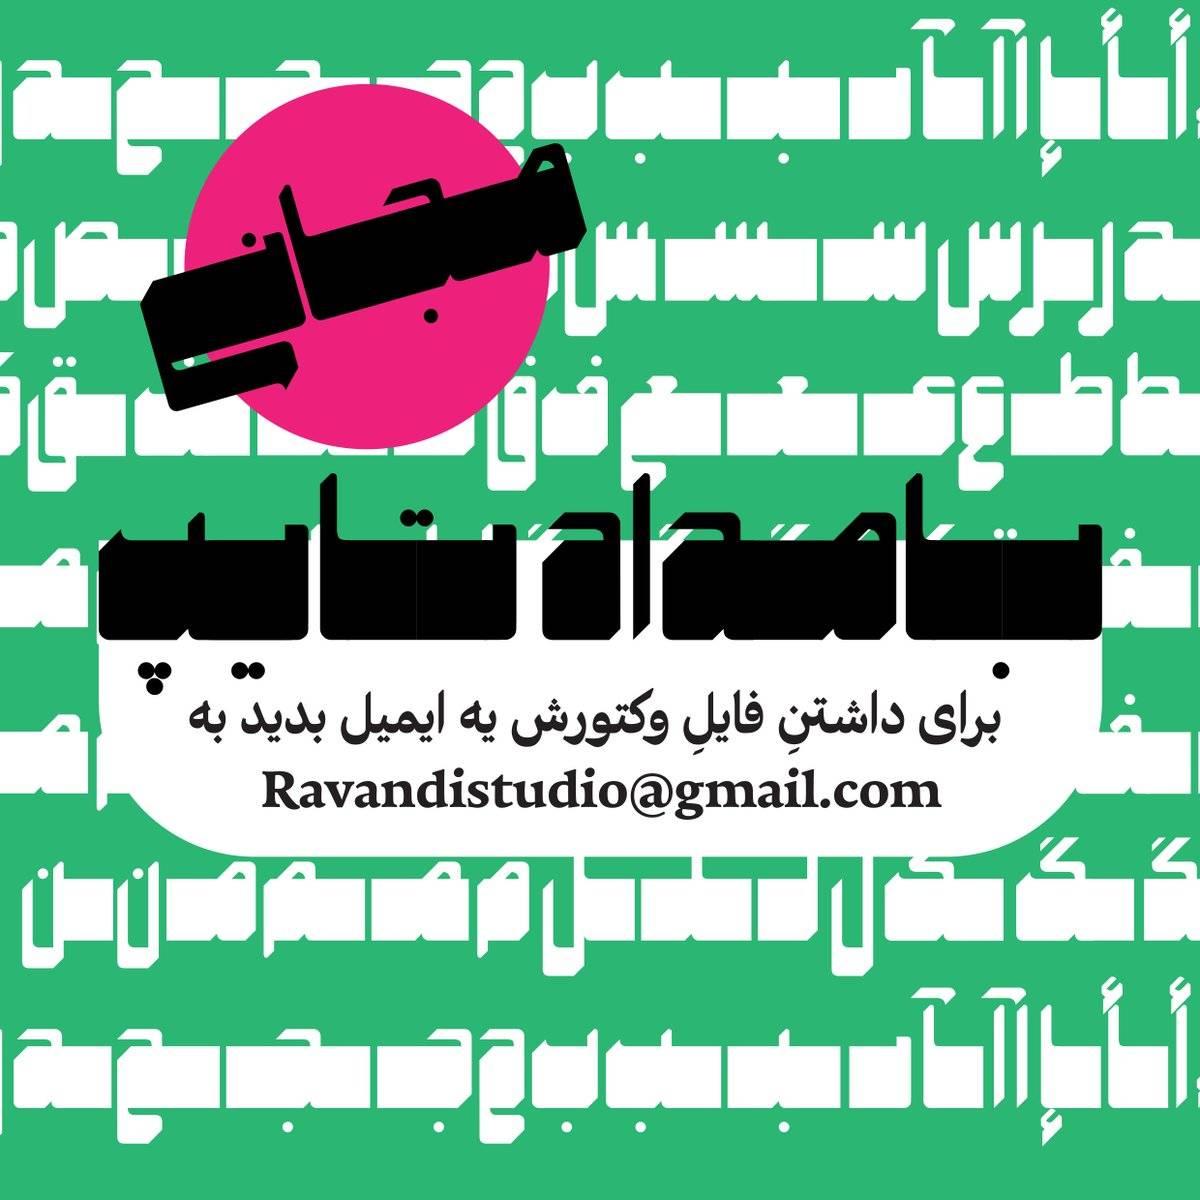 دانلود فونت فارسی بامداد Bamdad Typeface